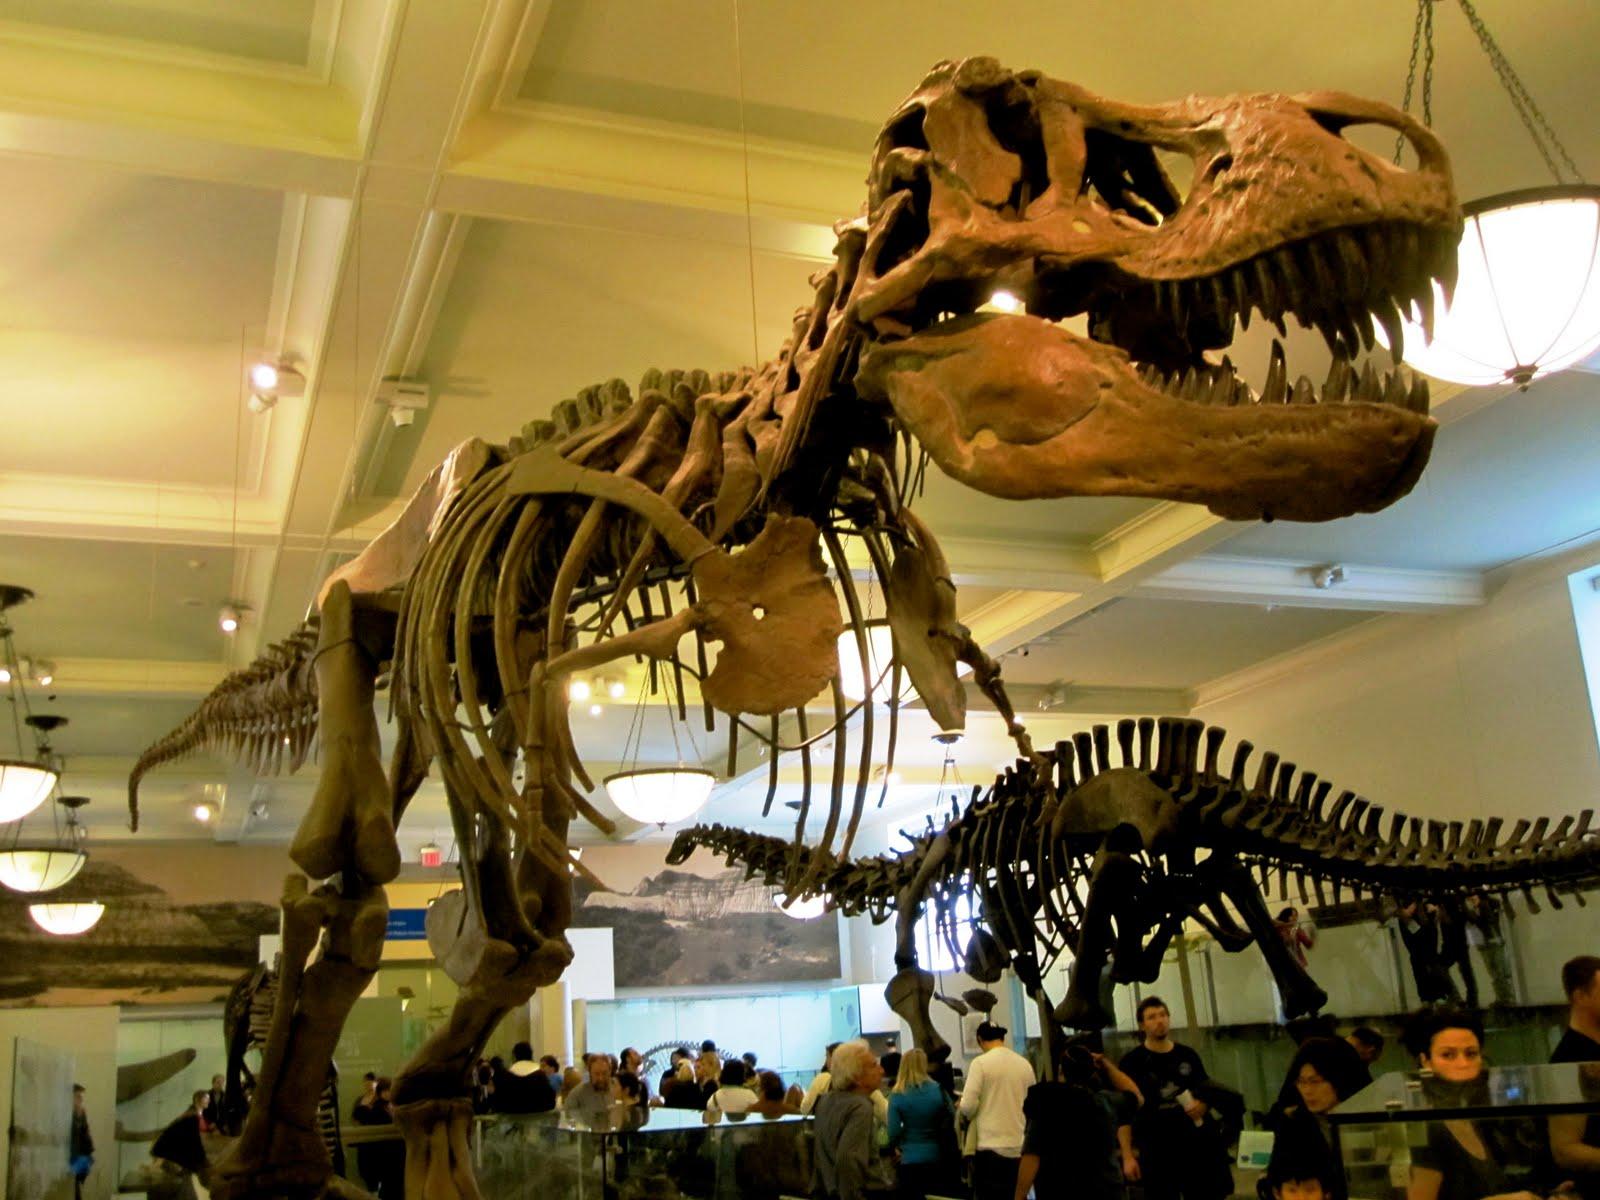 Jfk Airport To Natural History Museum